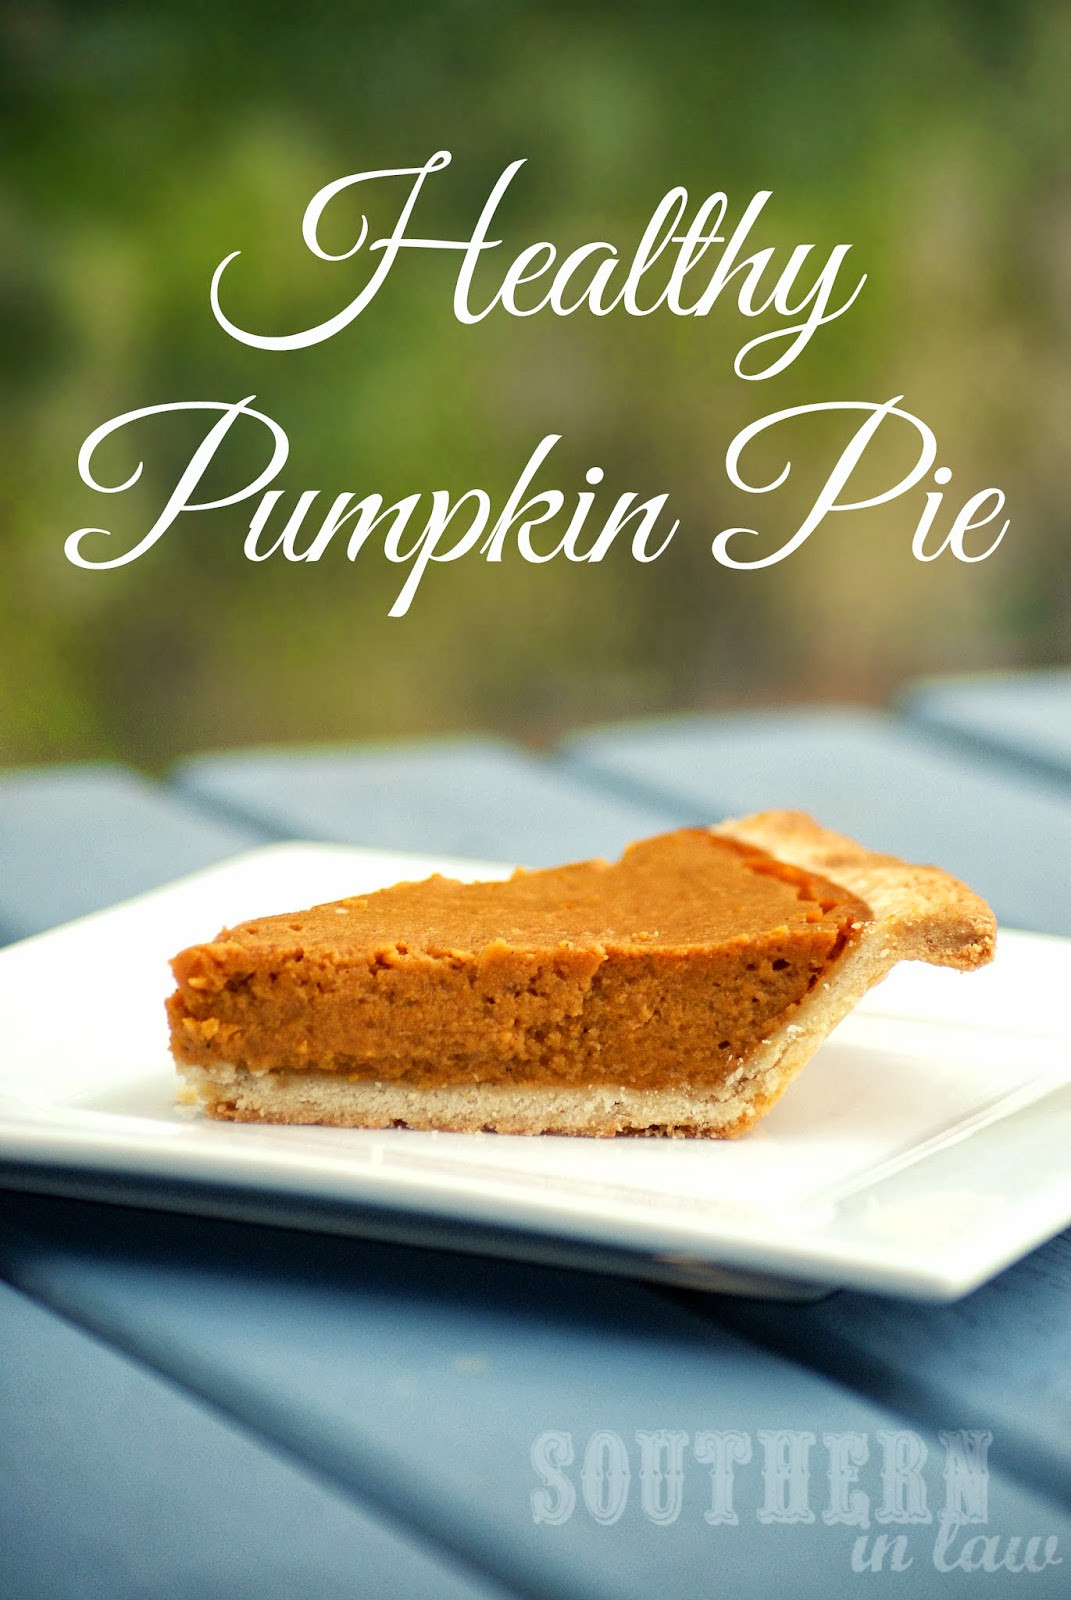 Healthy Pumpkin Recipes  Southern In Law Healthy Pumpkin Pie Recipe